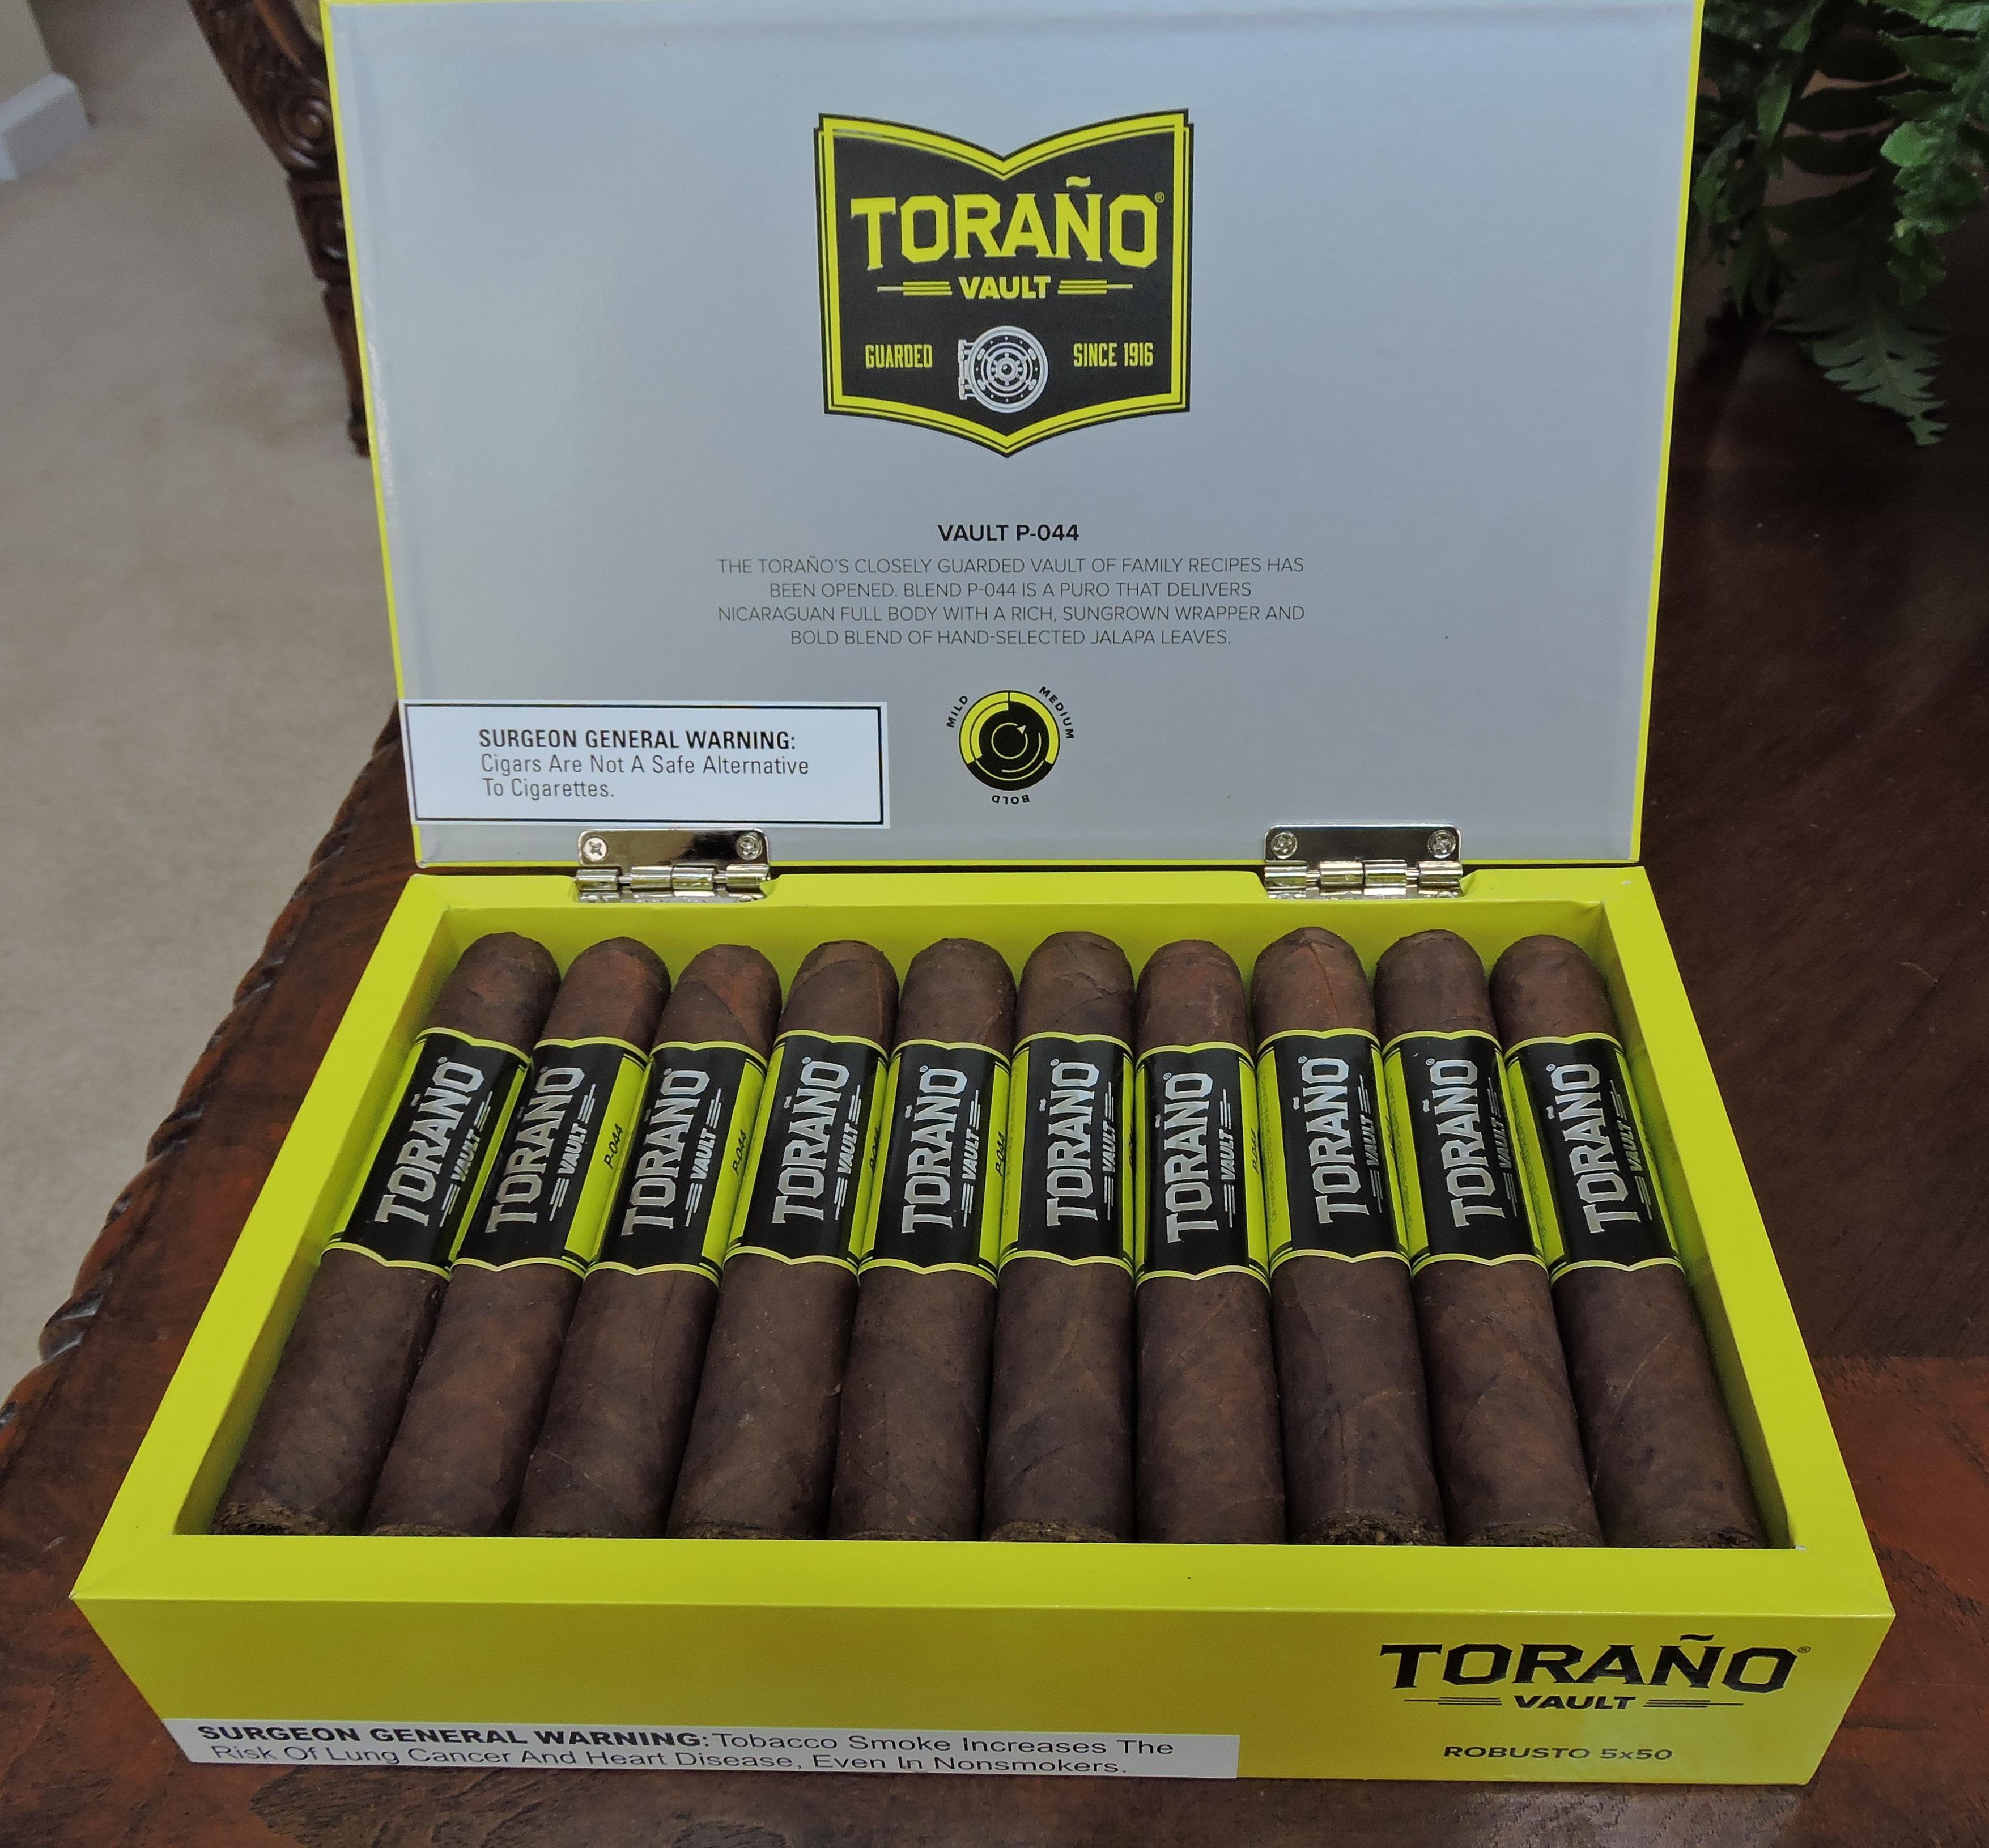 Torano_Vault_P-044_Robusto_BoxJPG